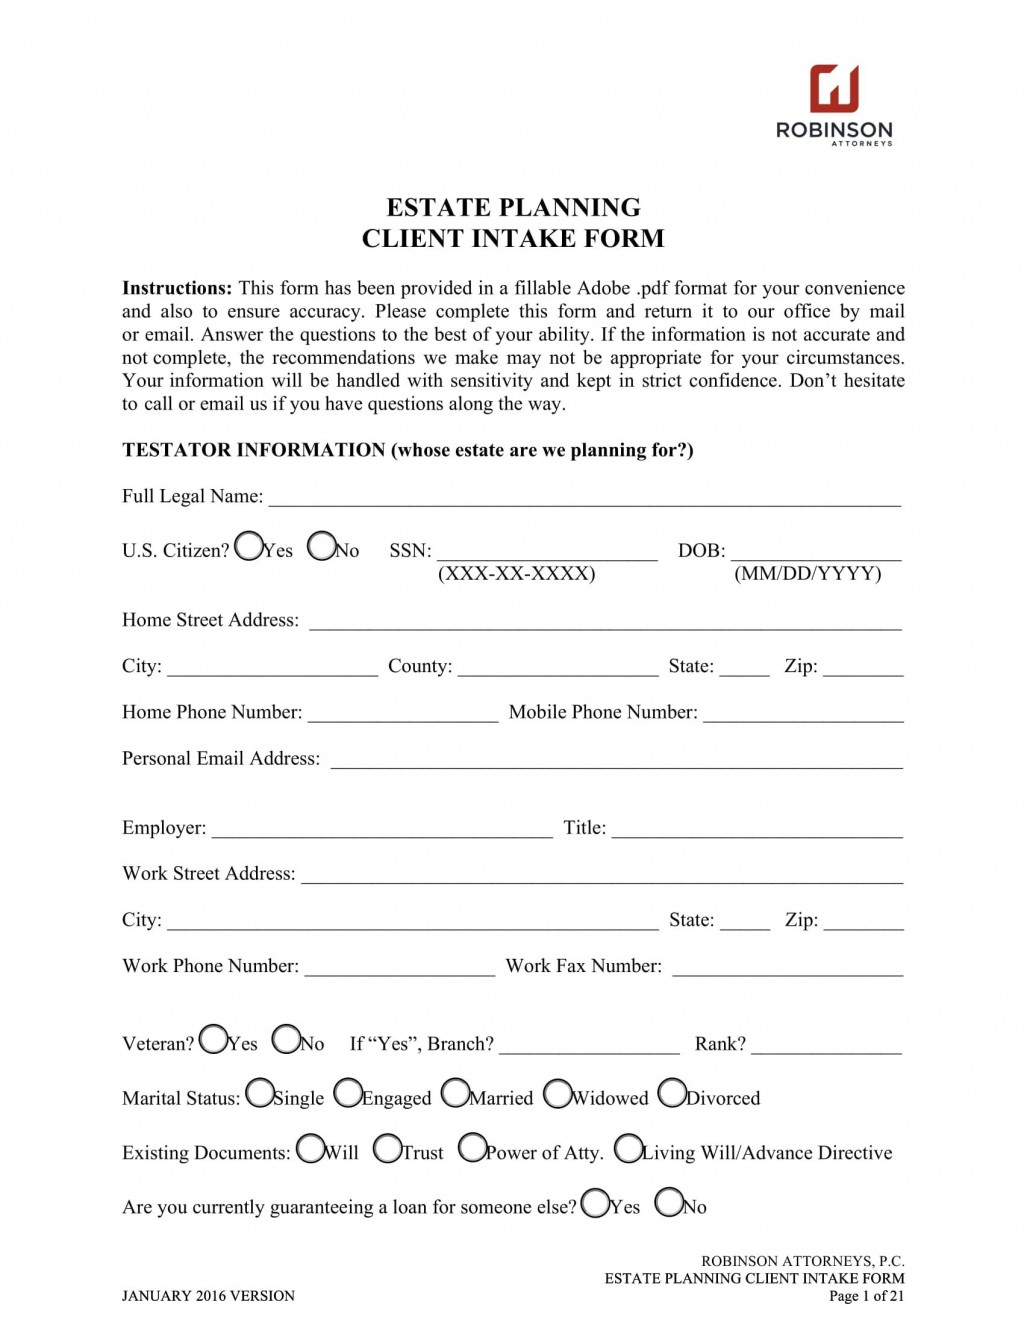 008 Sensational Client Information Form Template Free Download Design Large